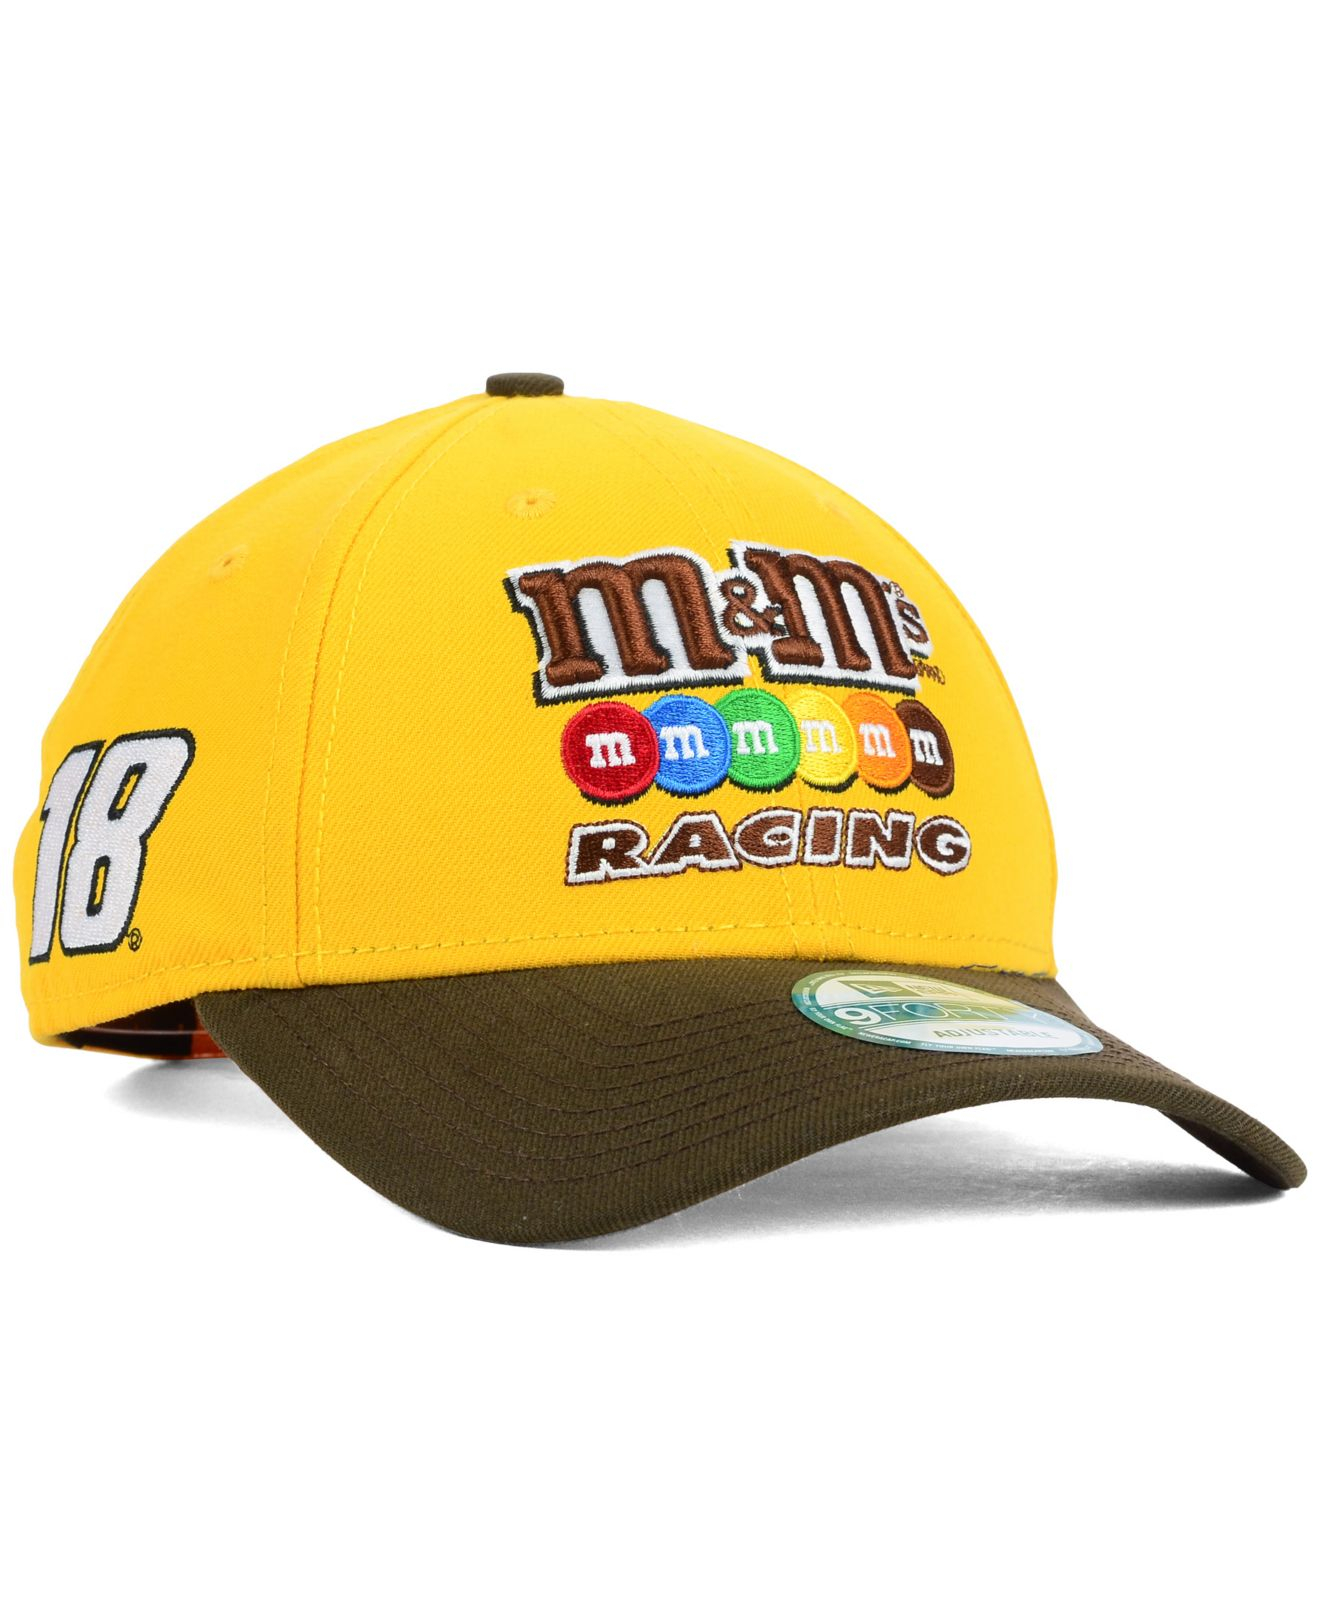 385ae47a9ad 84+ Kyle Busch Hats Kyle Busch Pit Caps Nascar Shop. Kyle Busch Hats ...